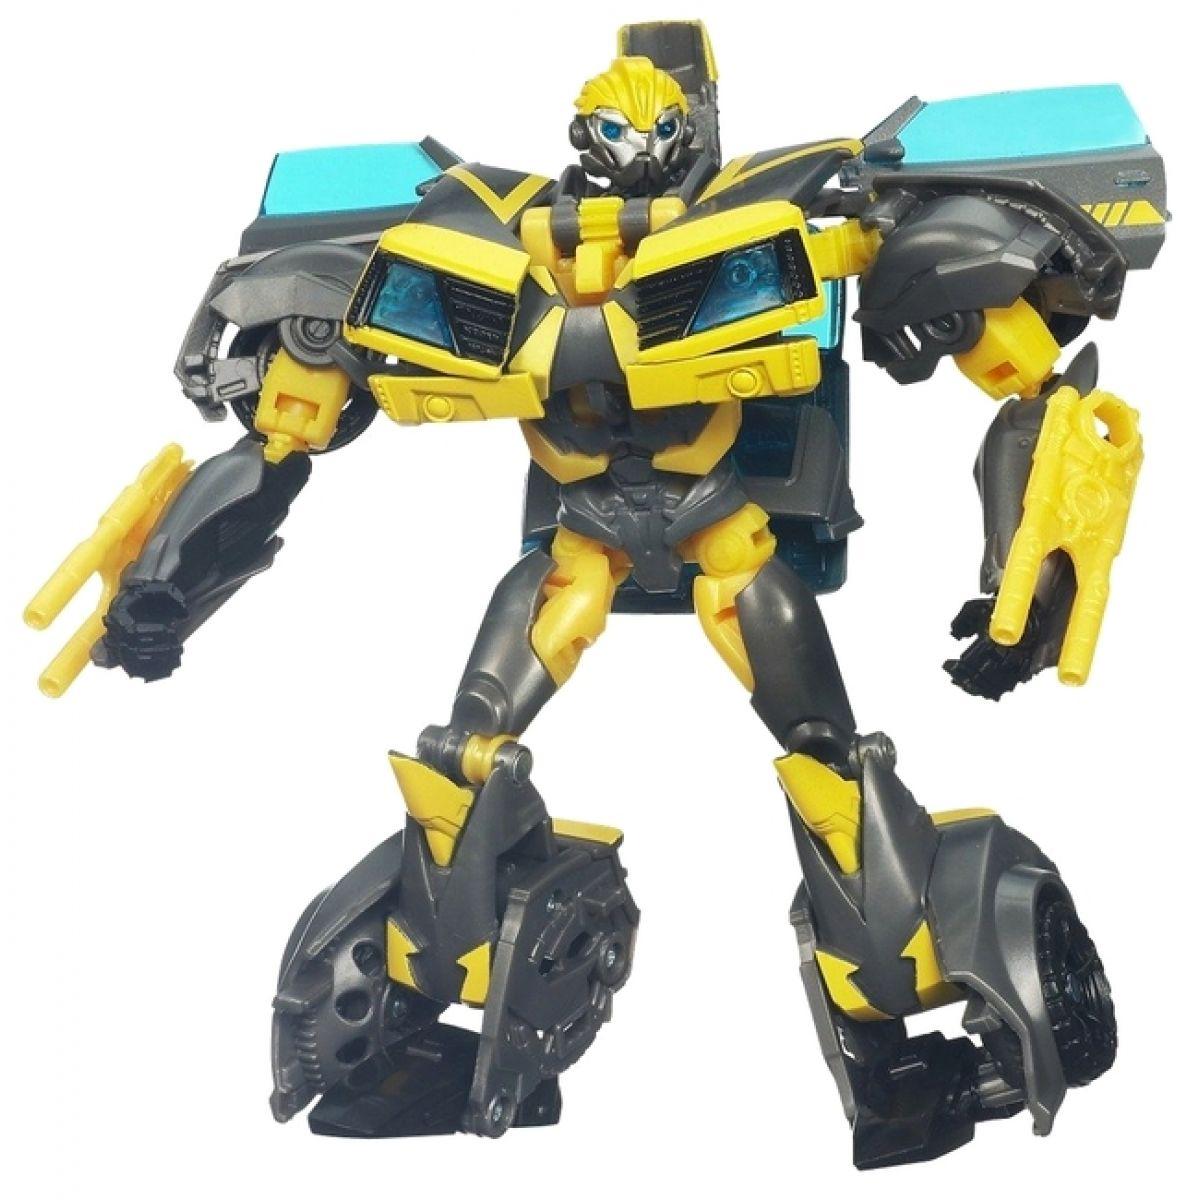 Transformers Robots in Disguise Hasbro - Shadow Strike Bumblebee